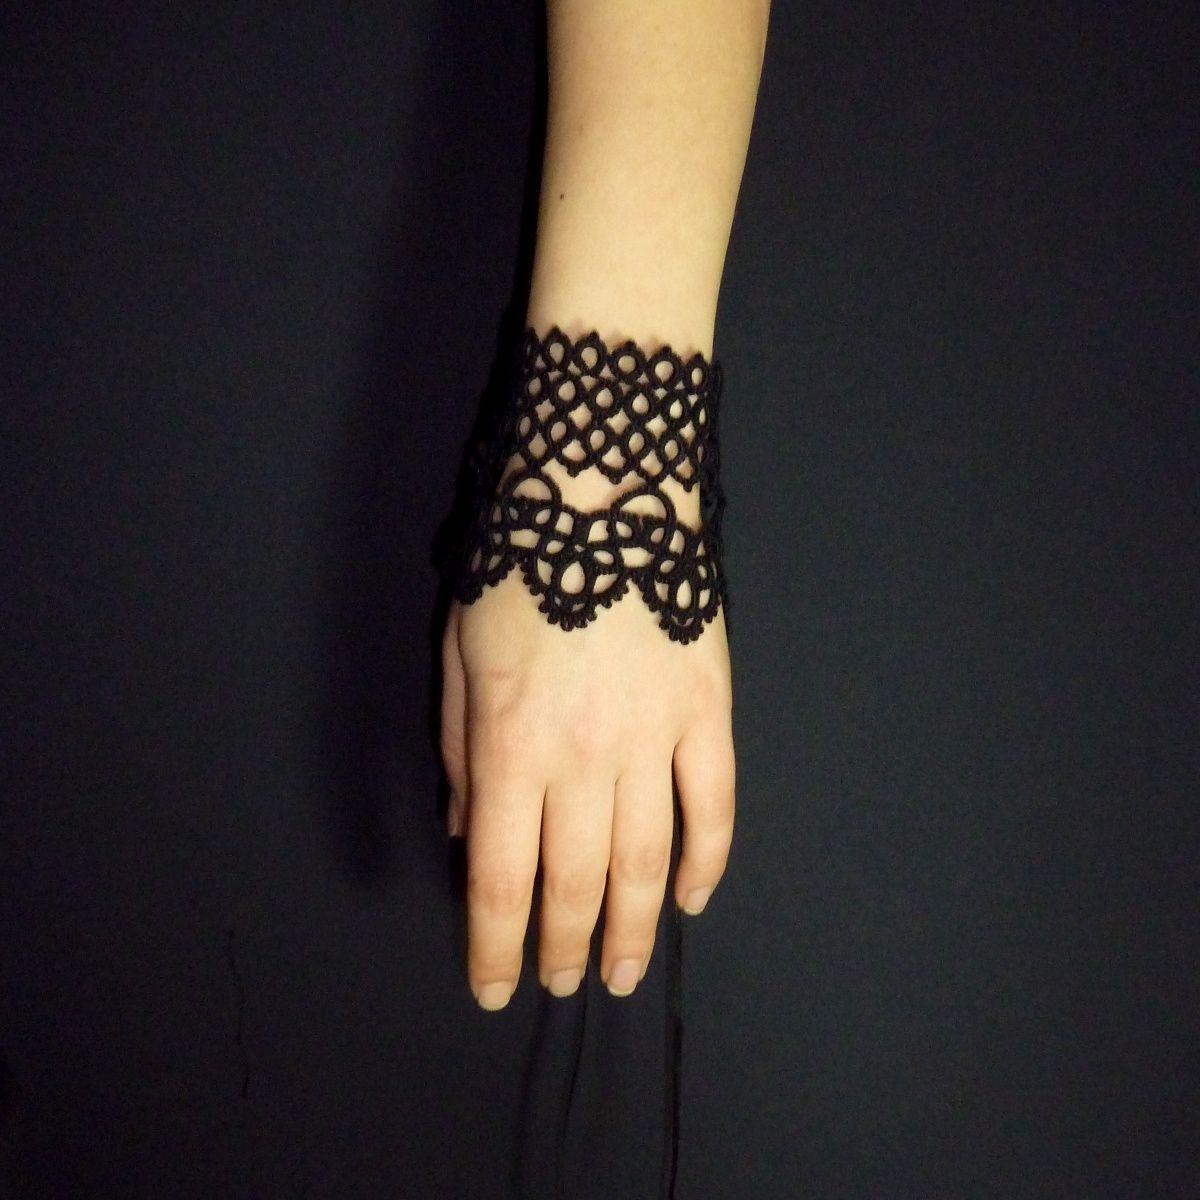 d8e18fba5d5a8 cuff tattoo for women | Victorian style lace cuff bracelet | Body ...